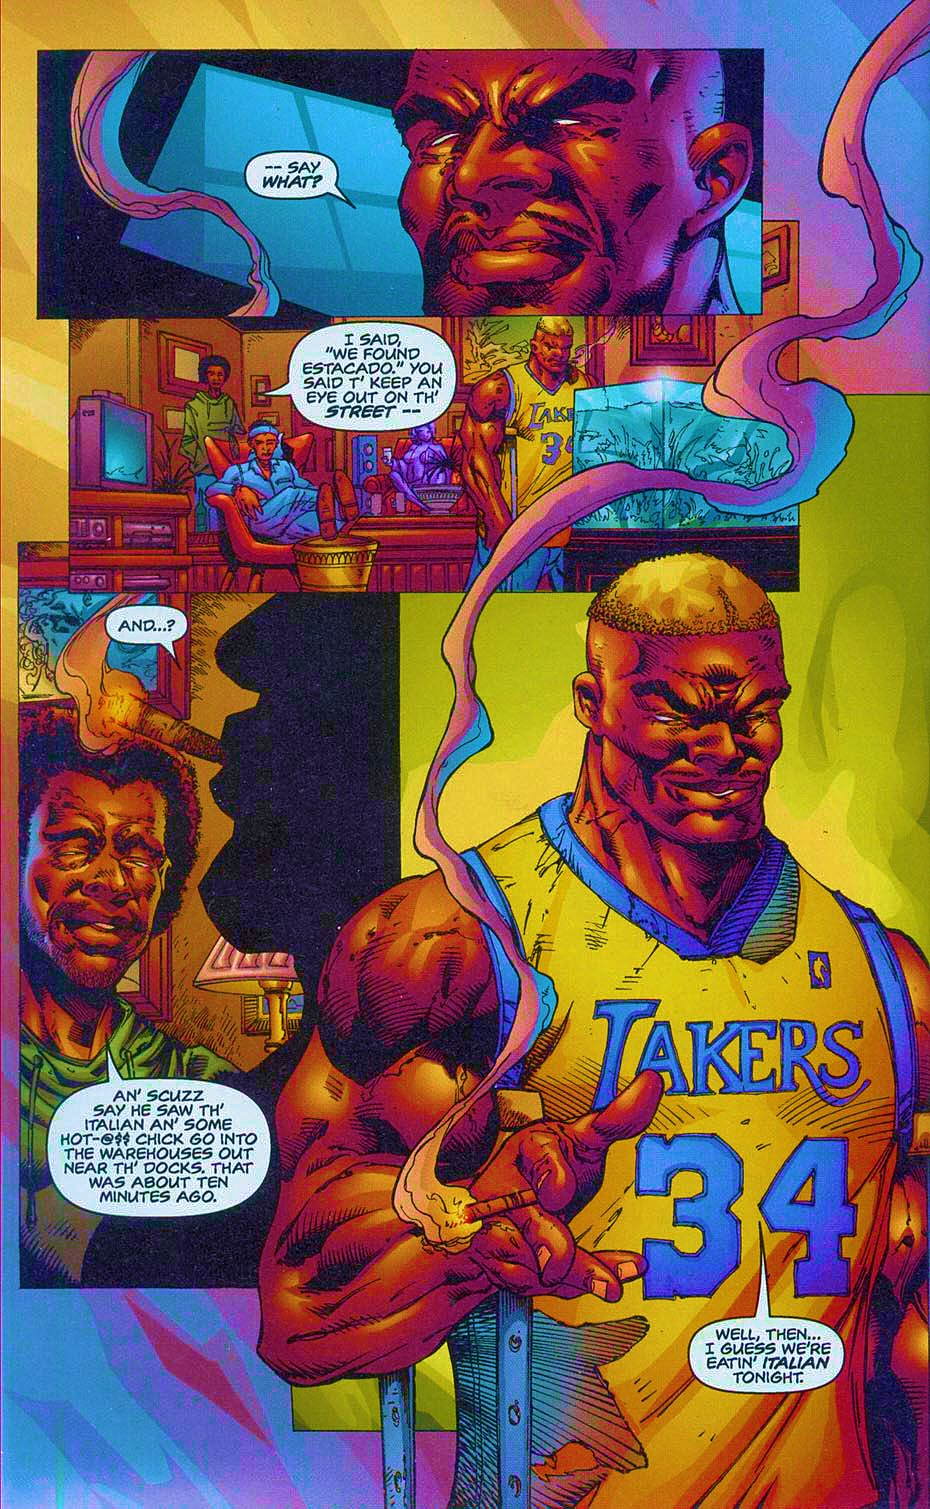 Read online Overkill: Witchblade/Aliens/Darkness/Predator comic -  Issue #2 - 13